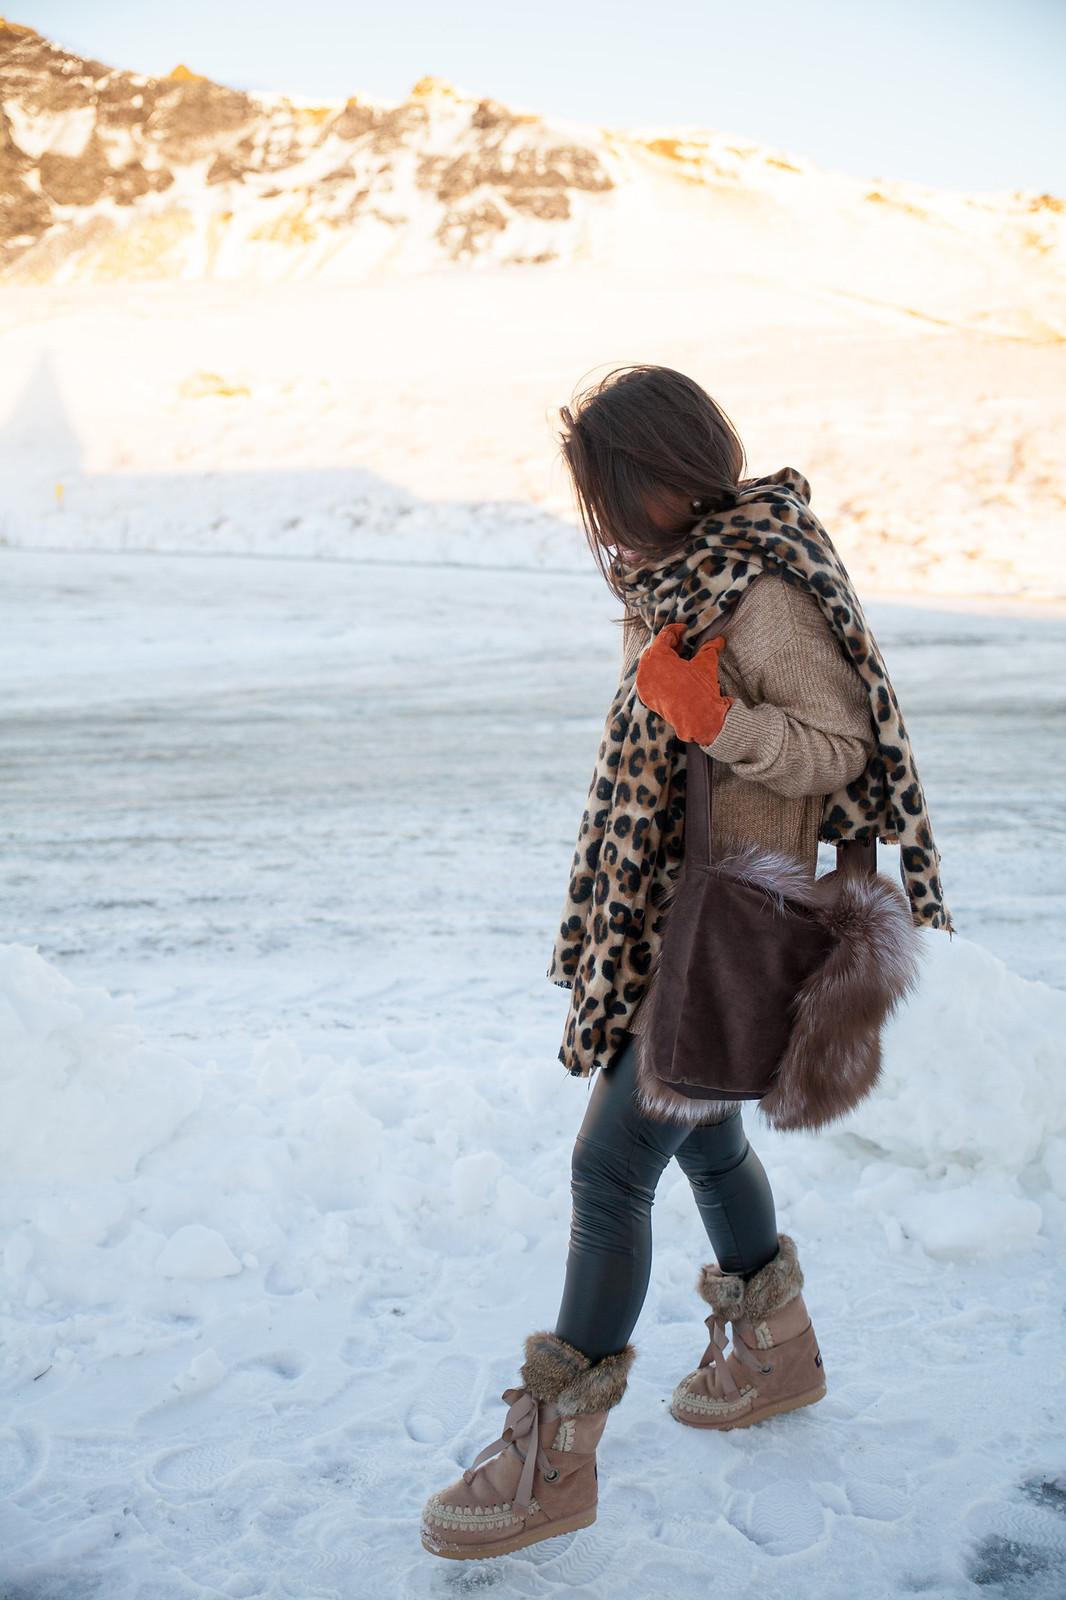 iceland theguestgirl laura santolaria ropa para ir a islandia diciembre auroras boreales bufanda de leopardo bolso de pelo barcelona influencer traveler mou boots outfit